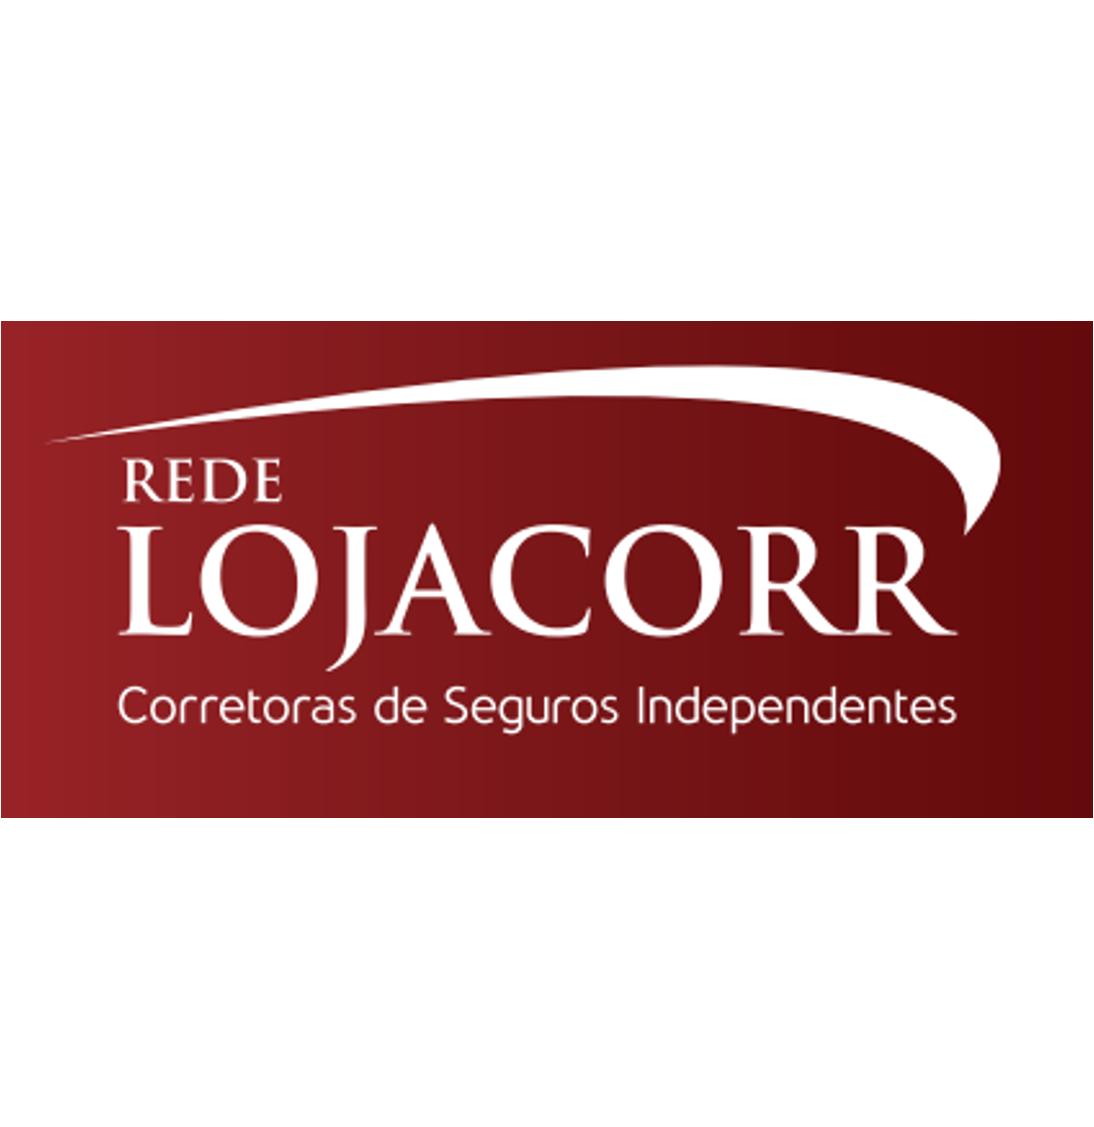 Lojascorr